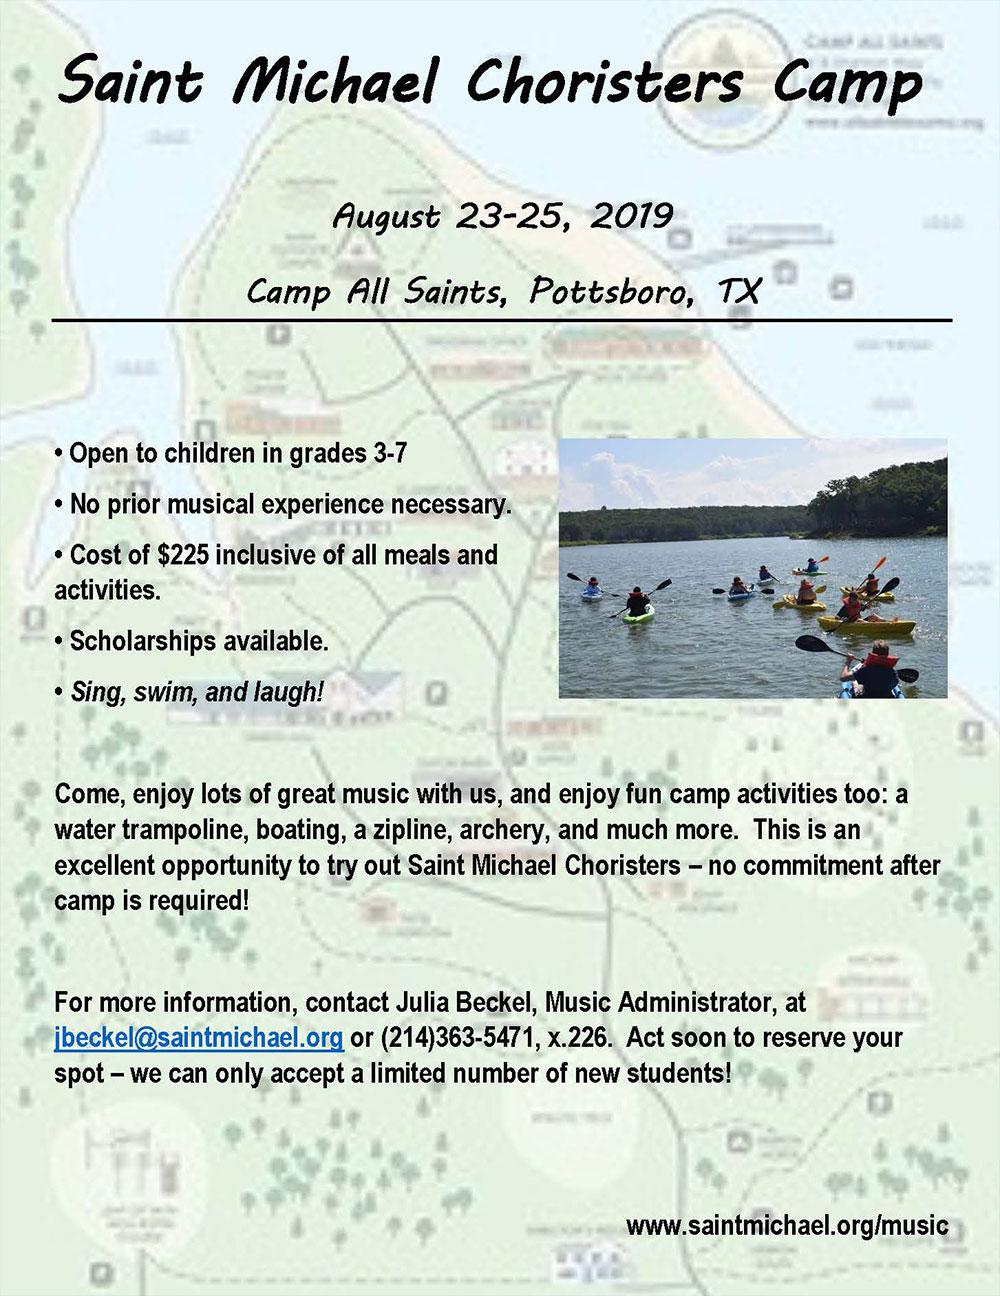 chorister-camp-flyer-web_916